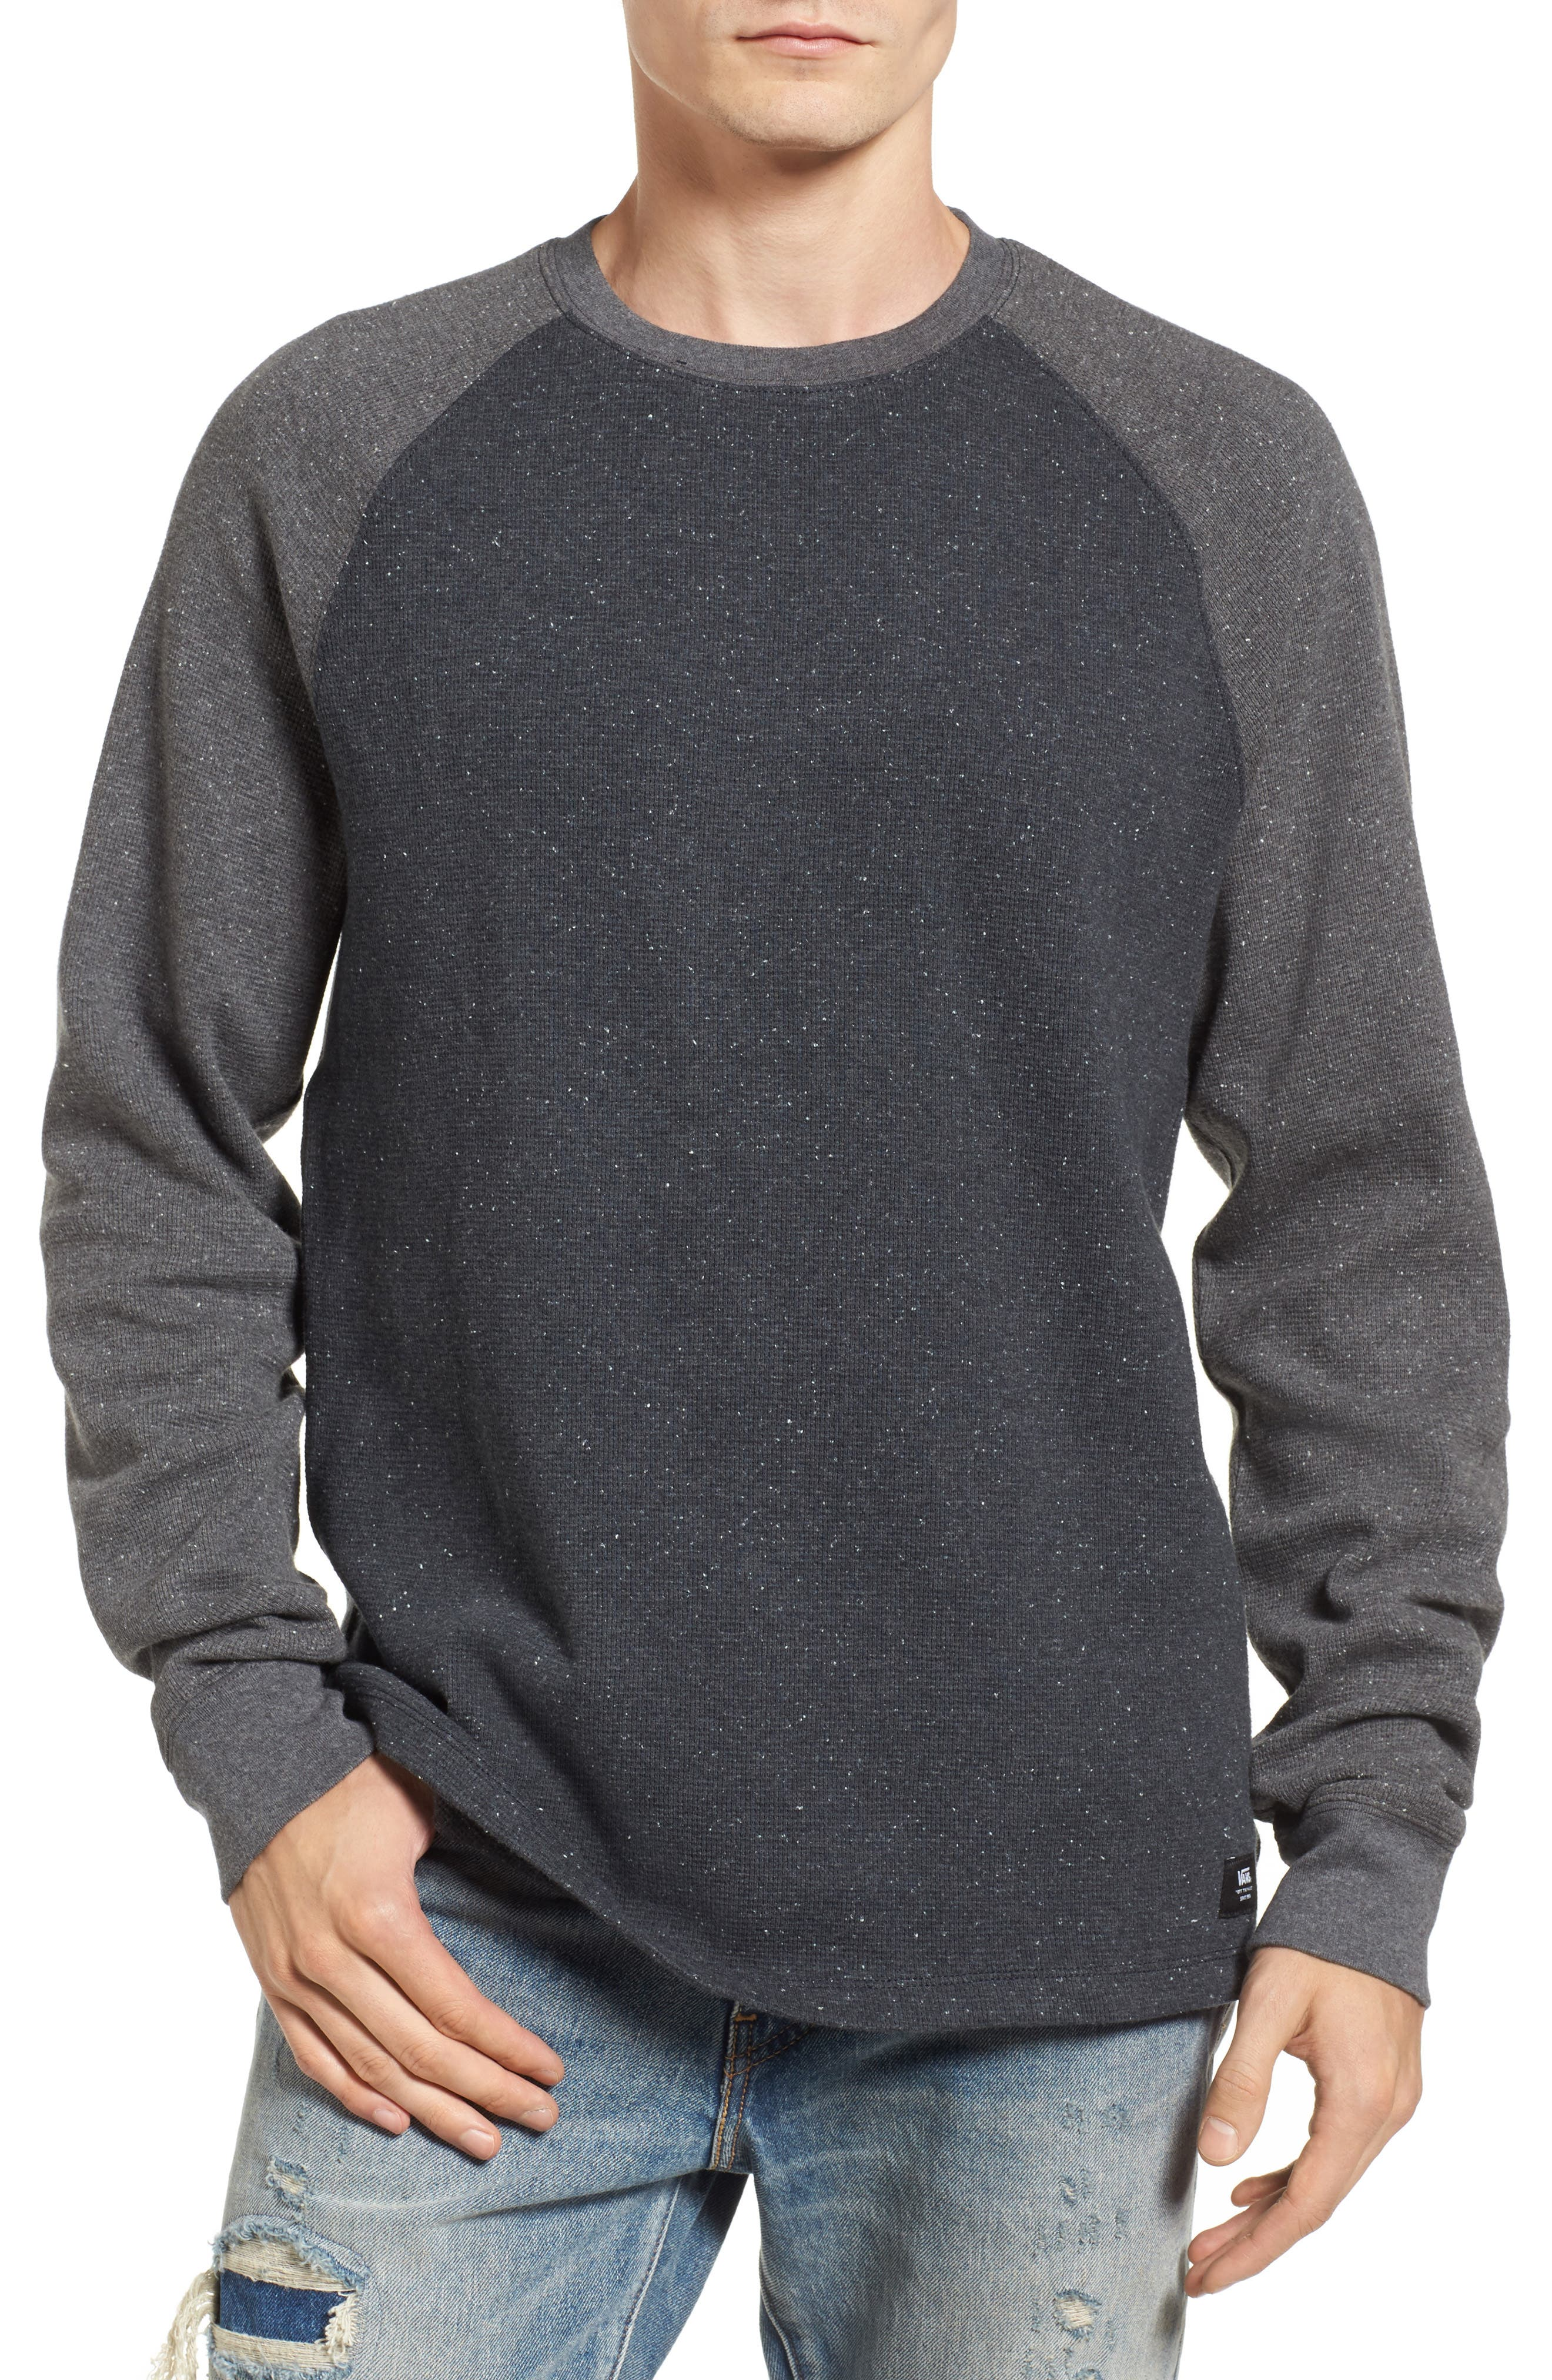 Burdett Thermal T-Shirt,                             Main thumbnail 1, color,                             001